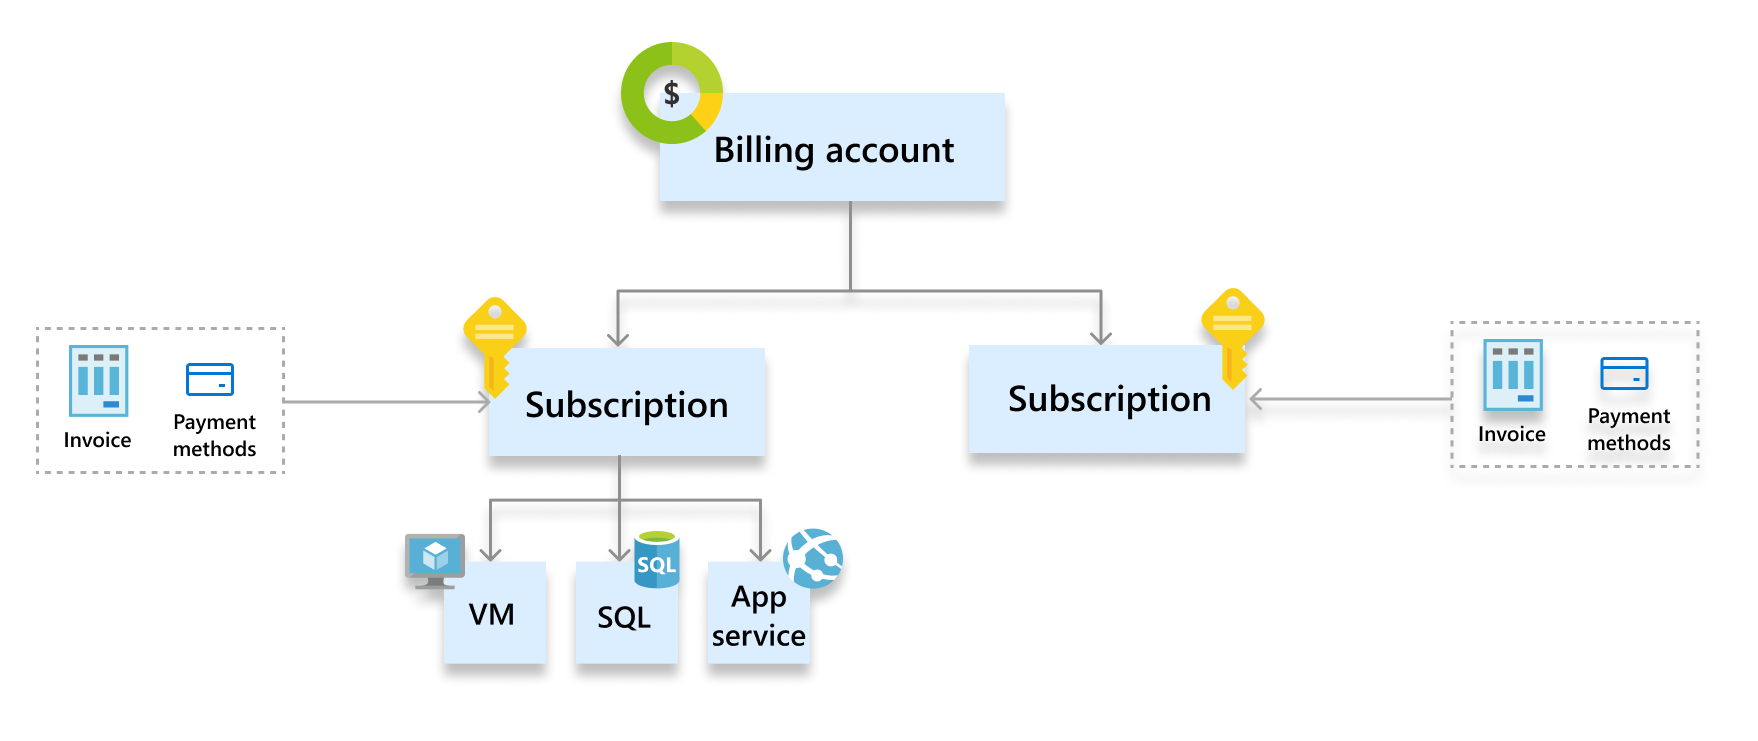 View your billing accounts in Azure portal   Microsoft Docs